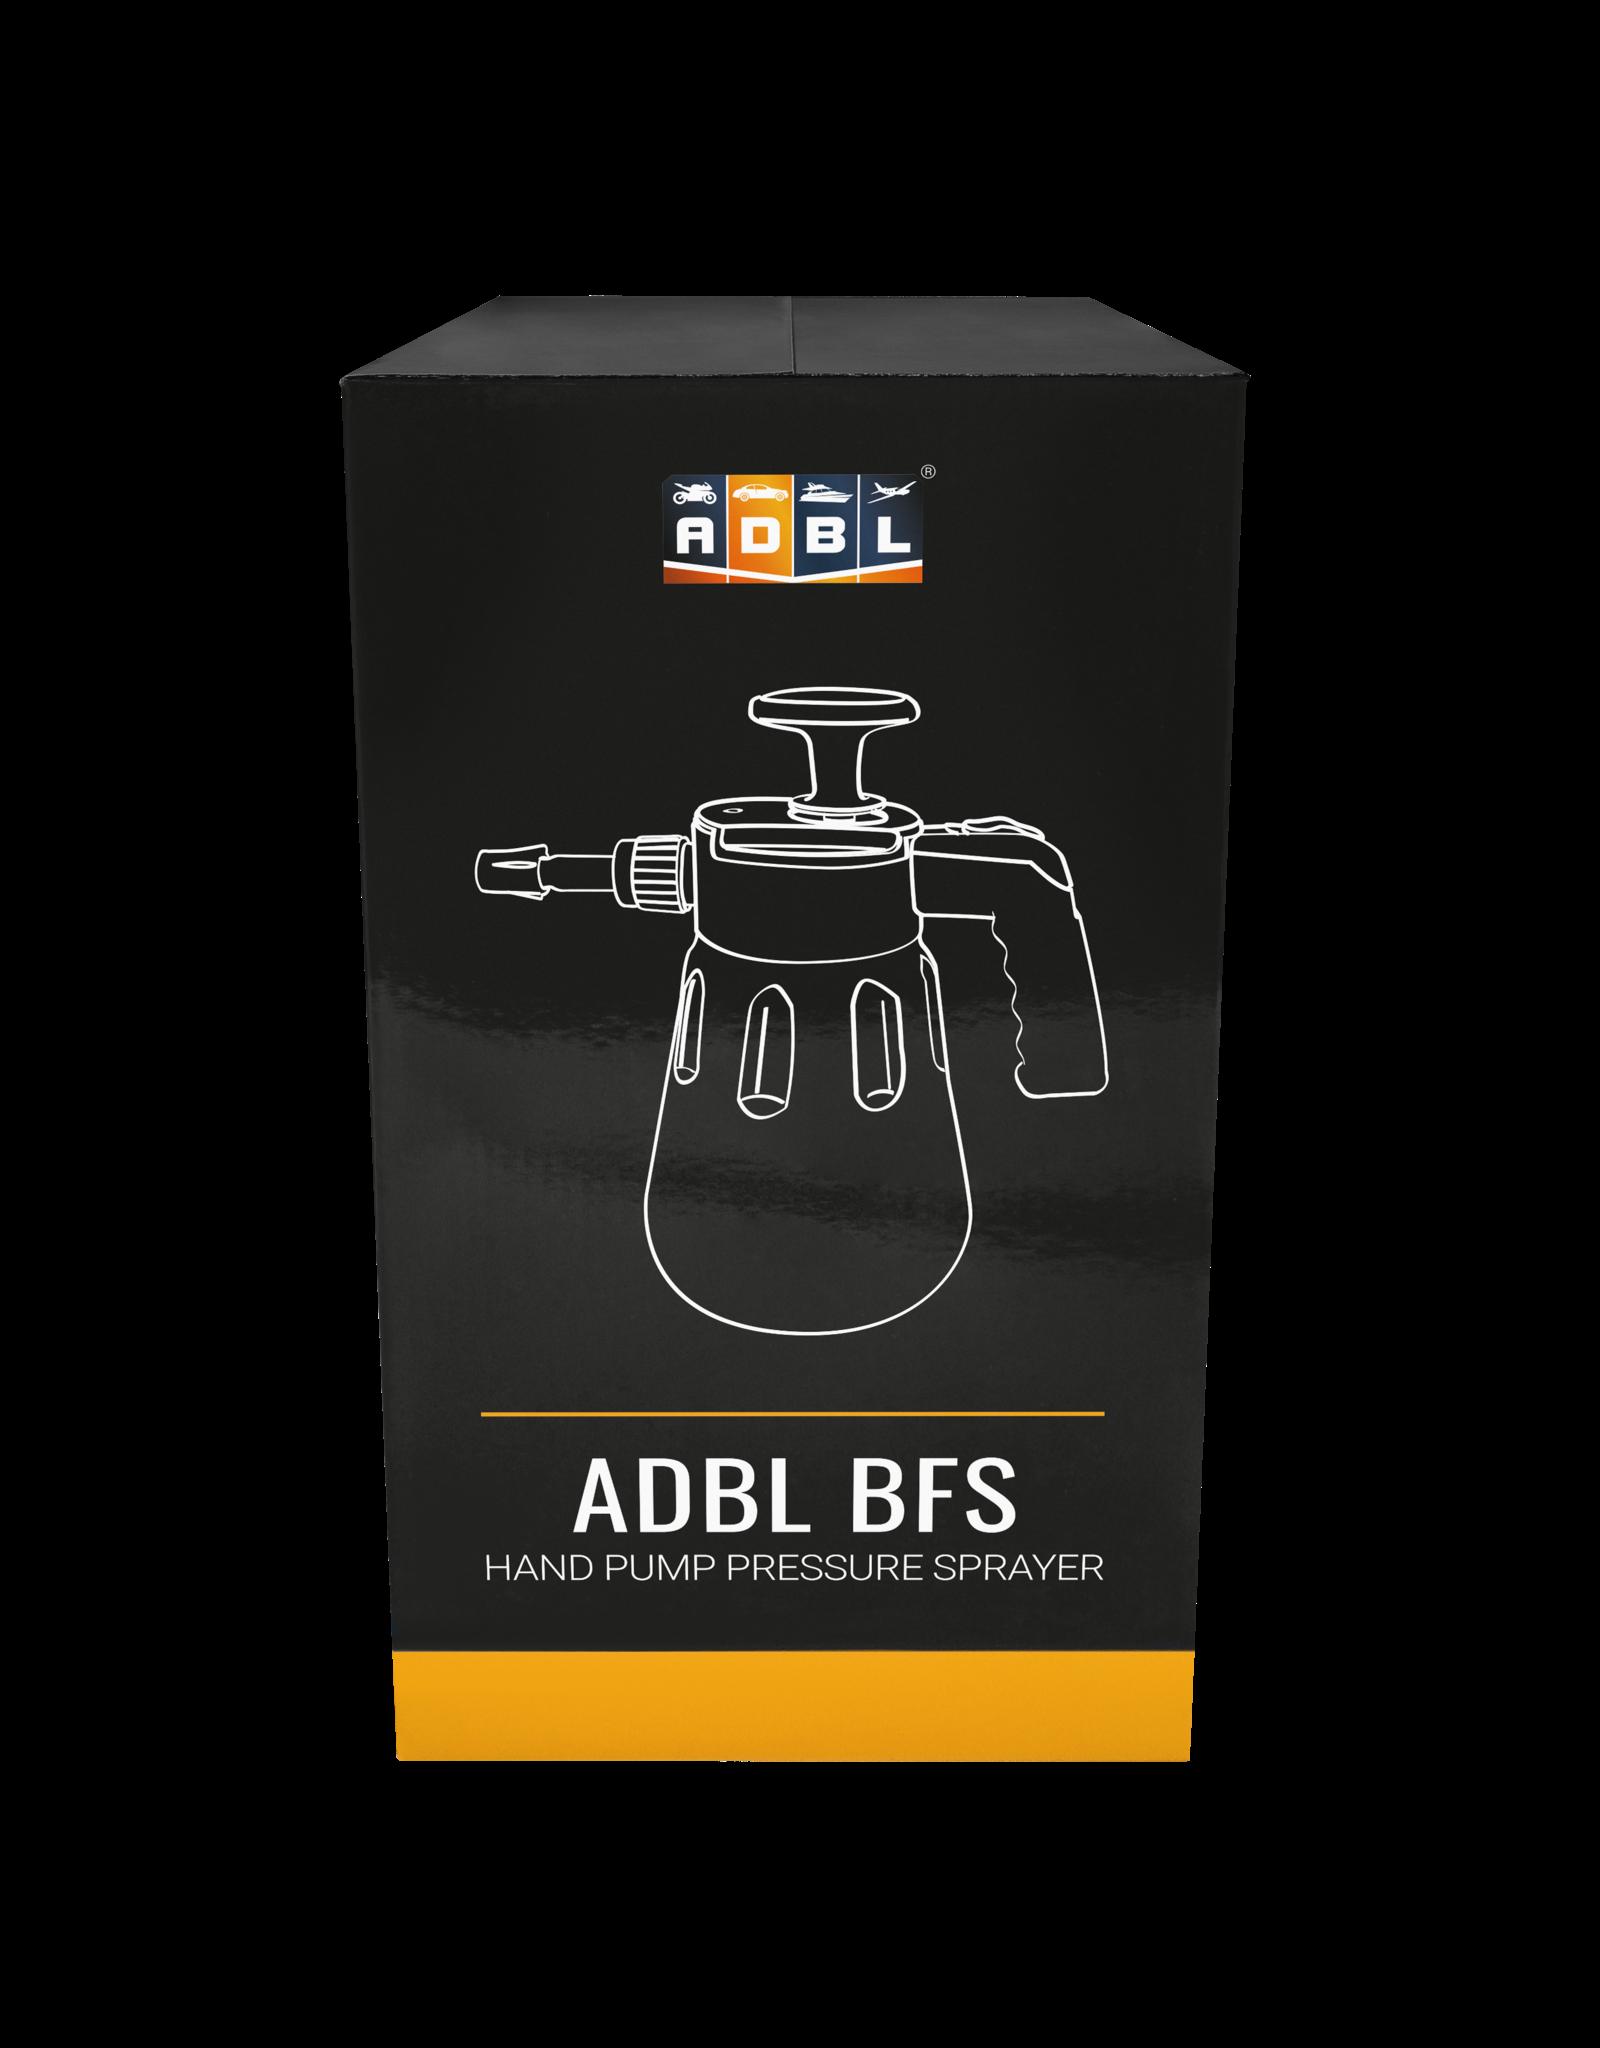 ADBL BFS